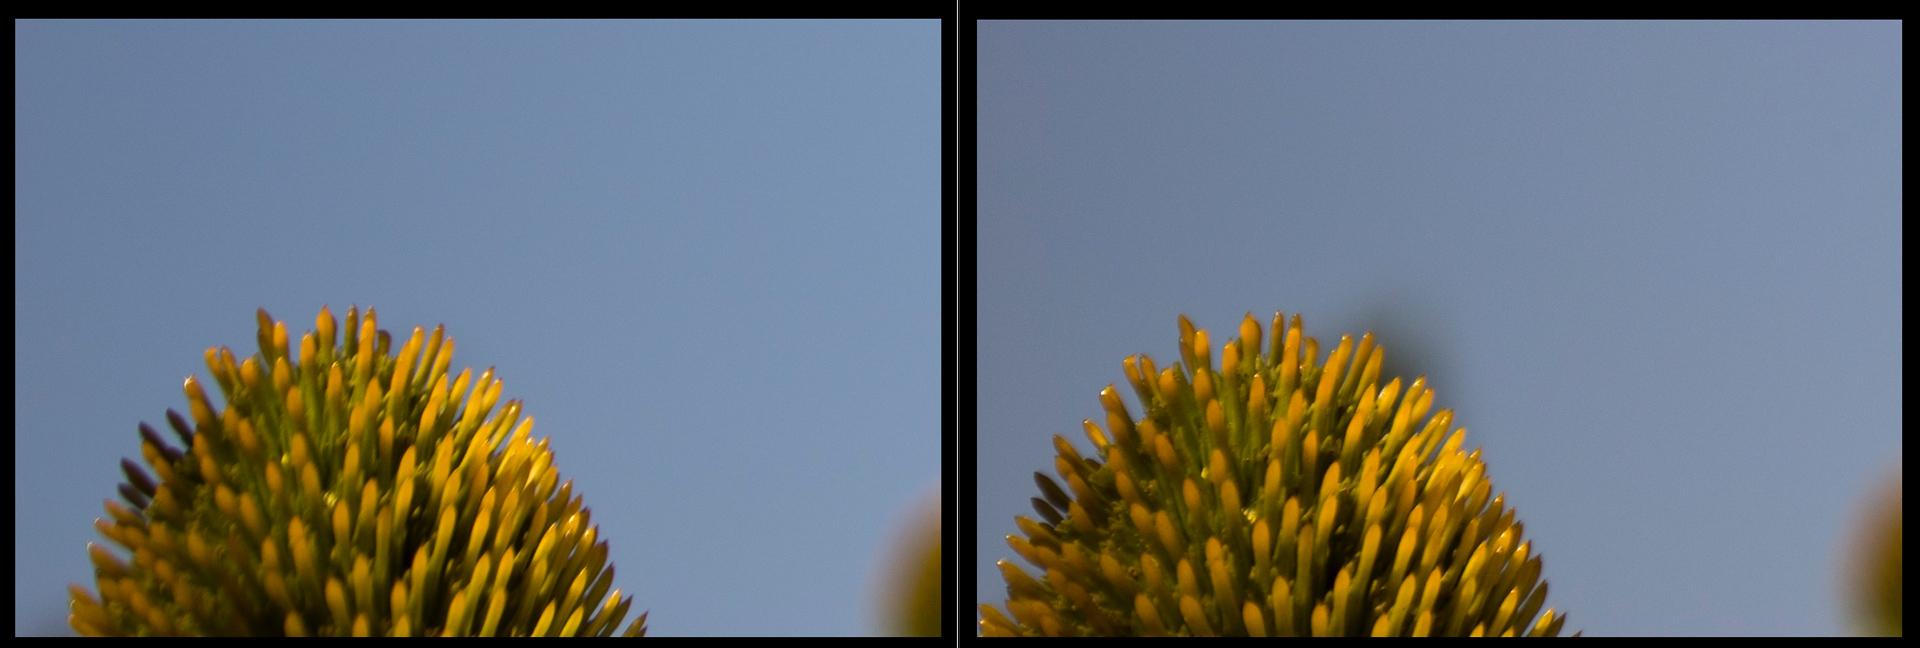 Canon 17-40mm F4 vs Canon 16-35mm F4 at 35mm F4 Corner Sharpness